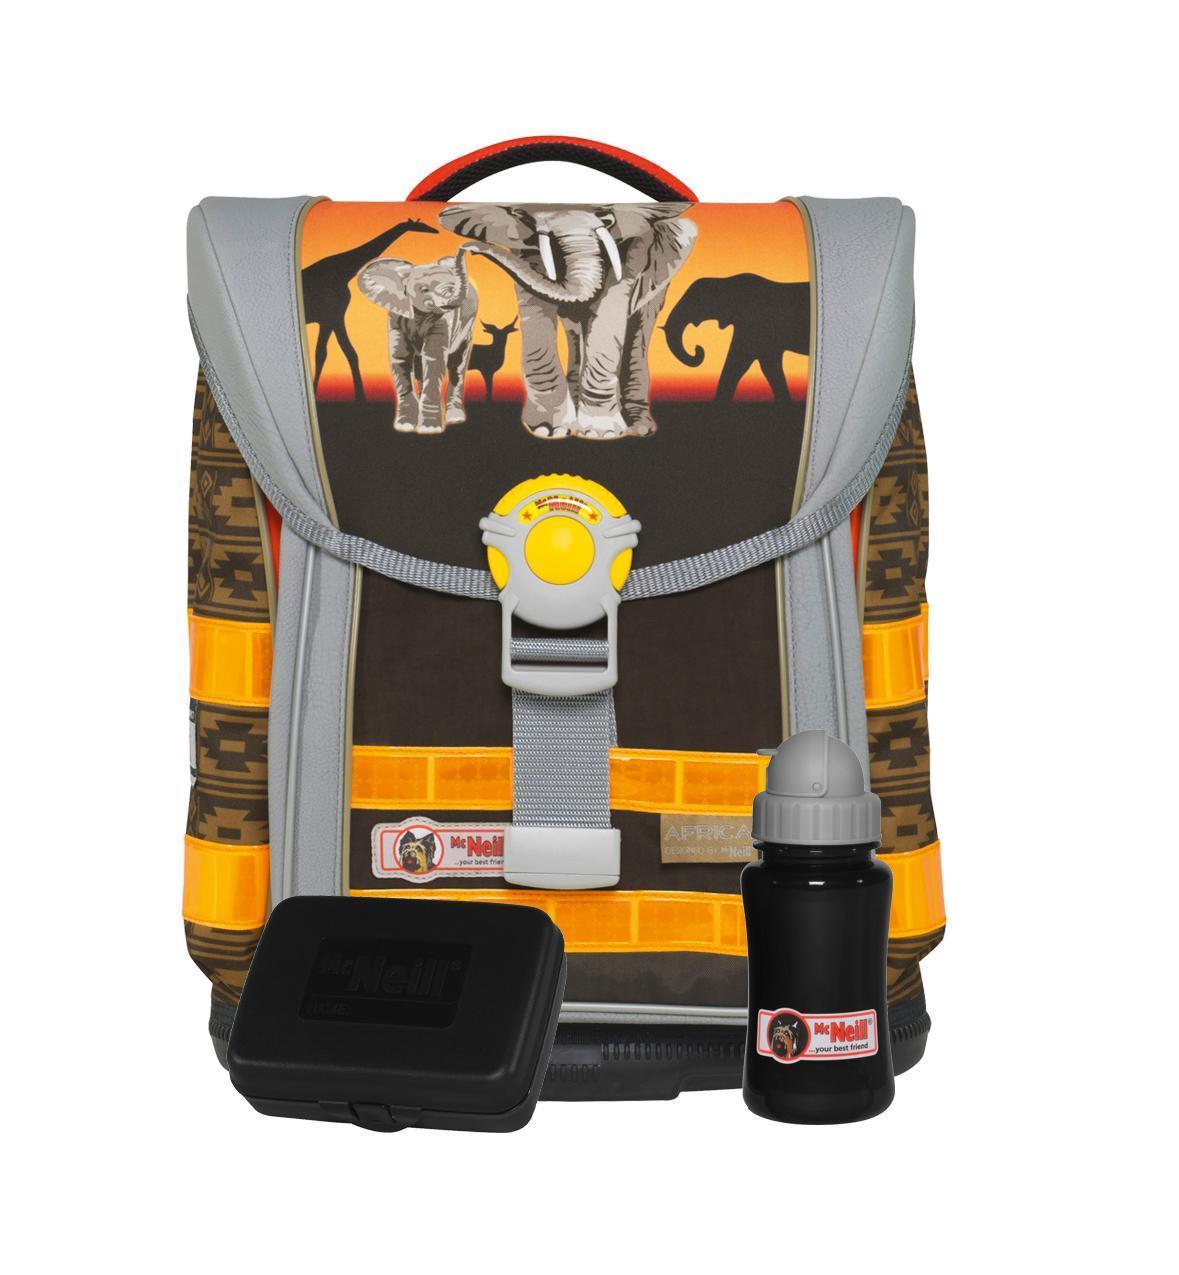 Рюкзак детский McNeill ERGO Light COMPACT Африка9560140000